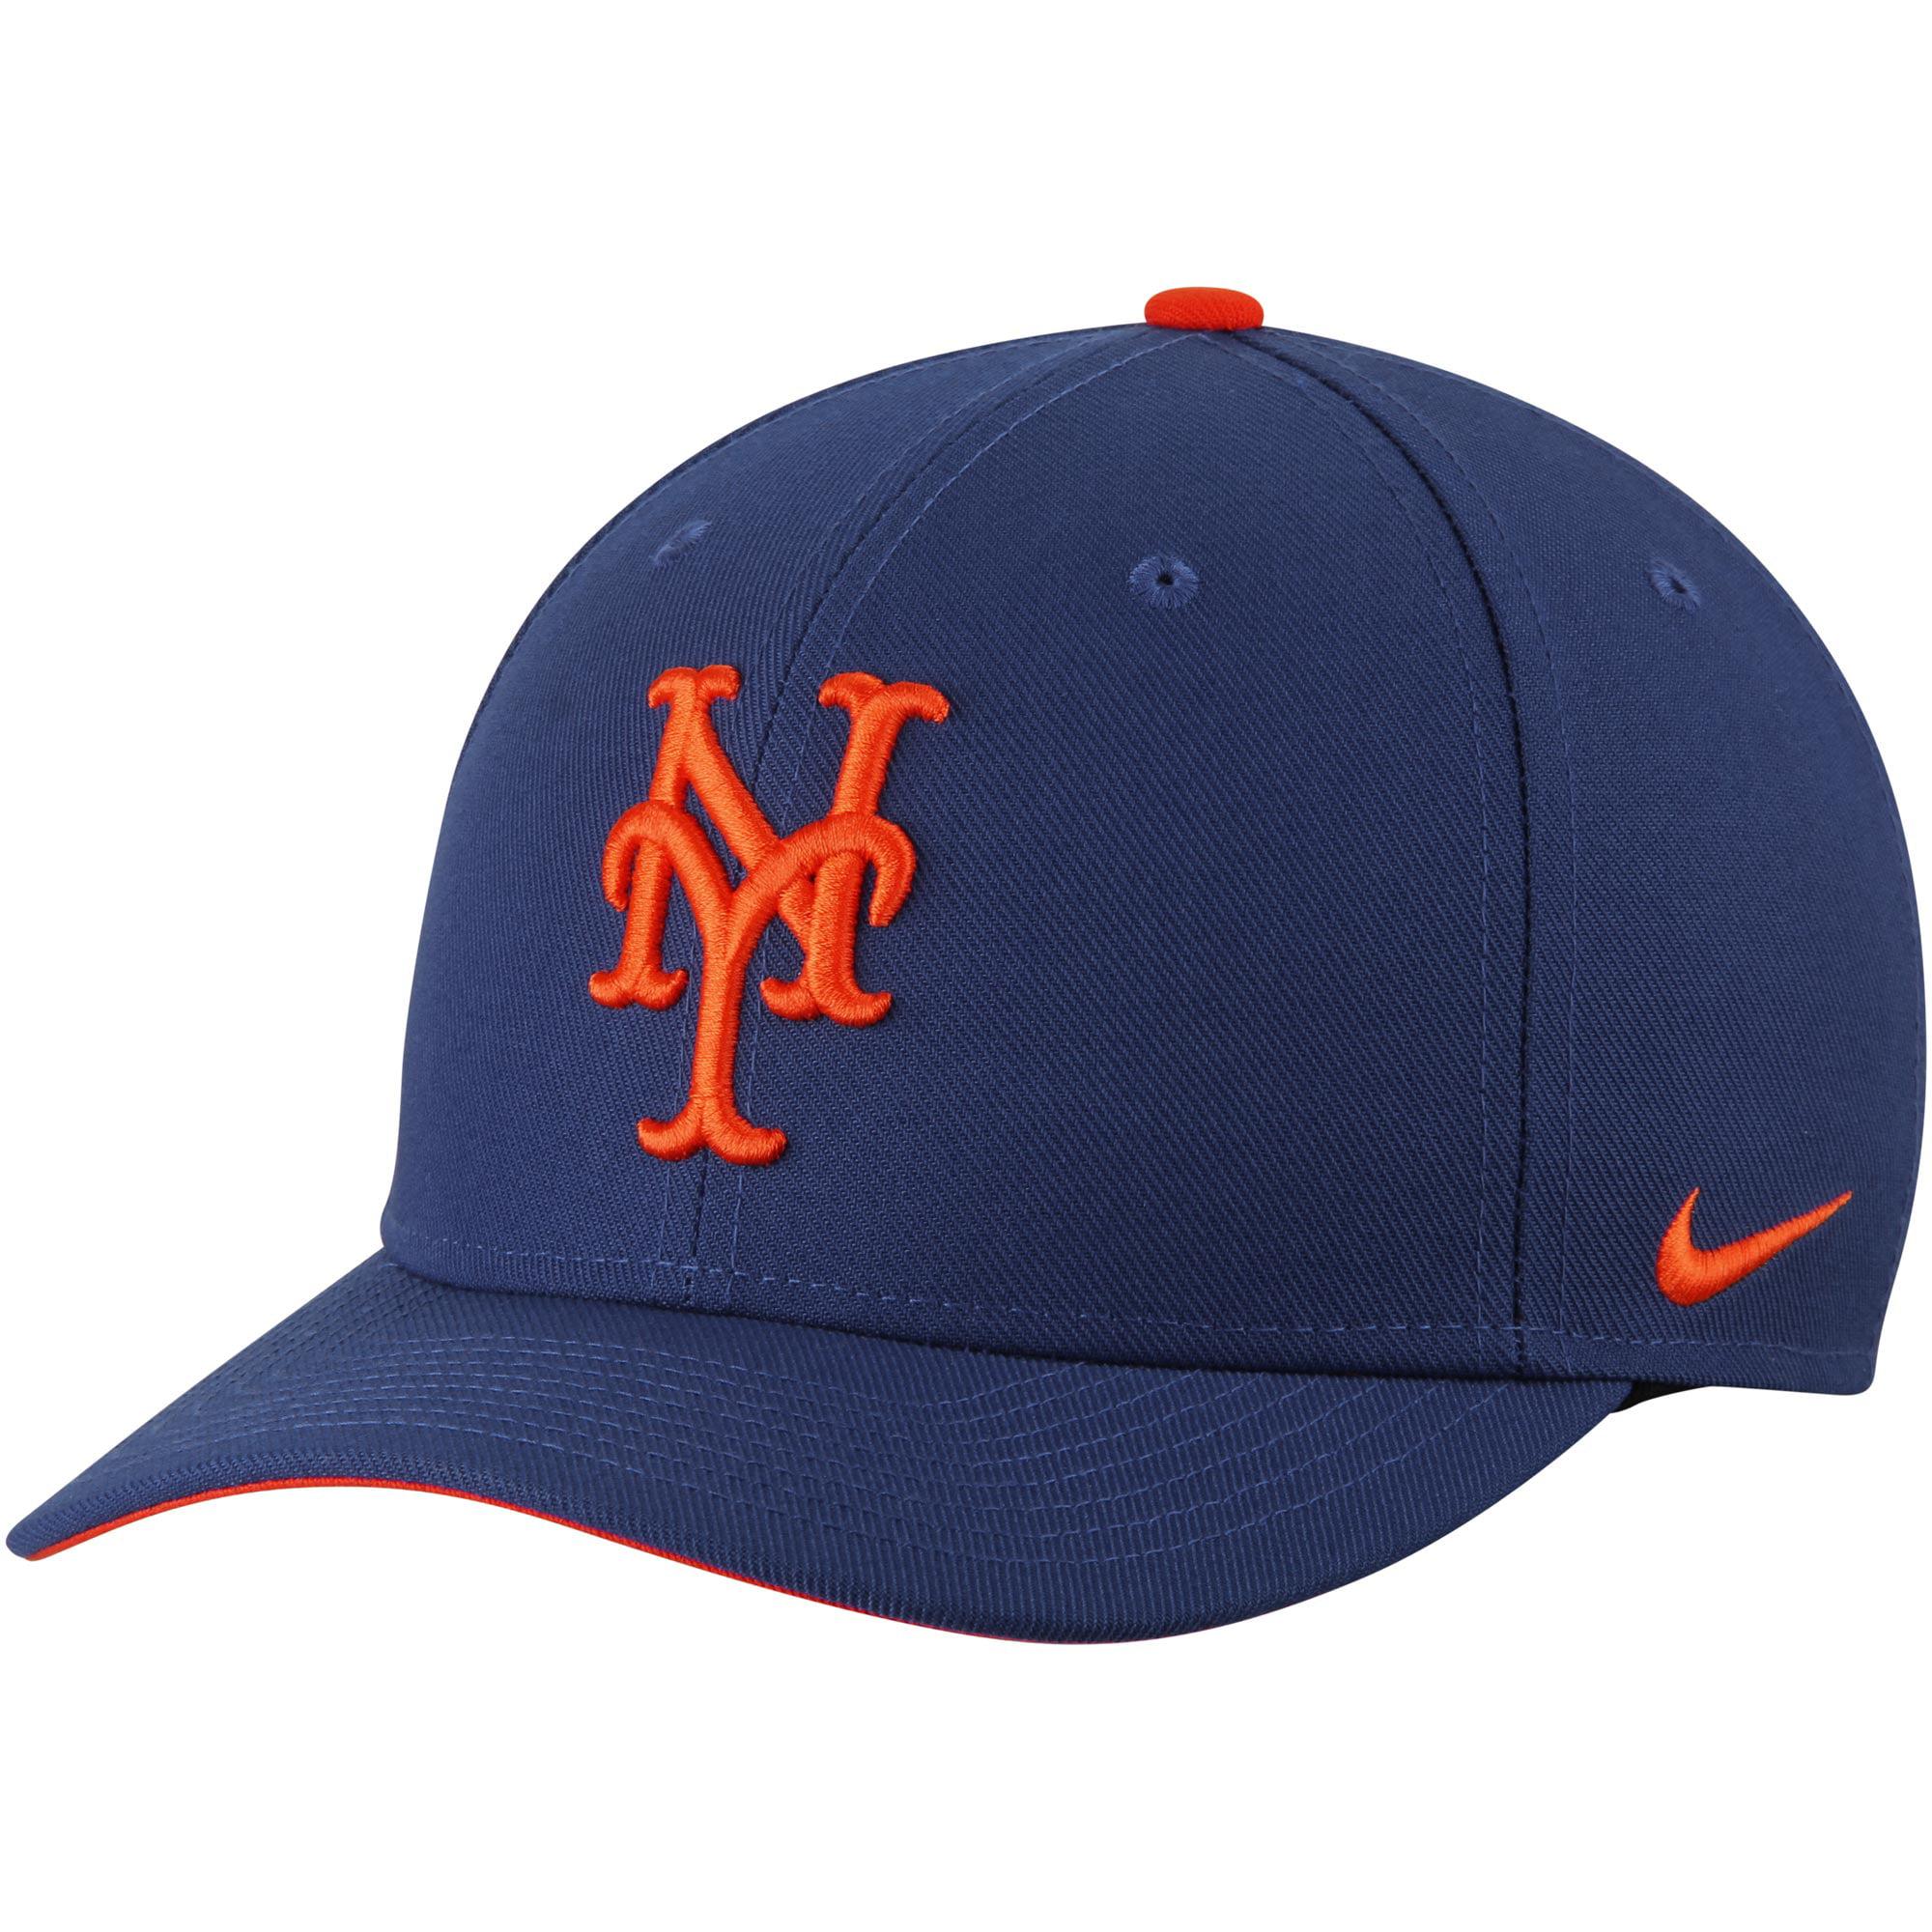 New York Mets Nike Classic Adjustable Performance Hat - Royal - - OSFA